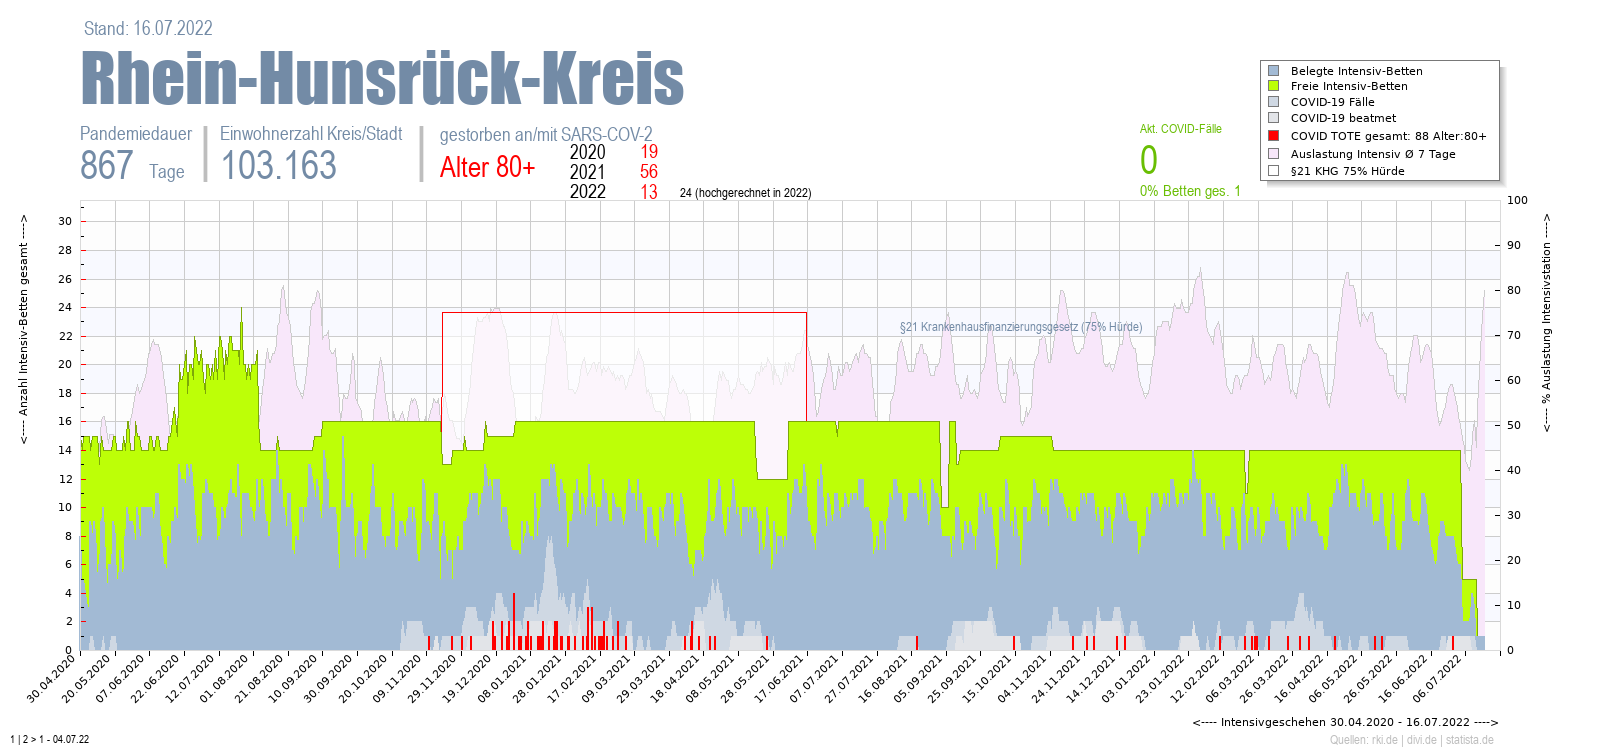 Intensivstation Auslastung Rhein-Hunsrück-Kreis Alter 0-4